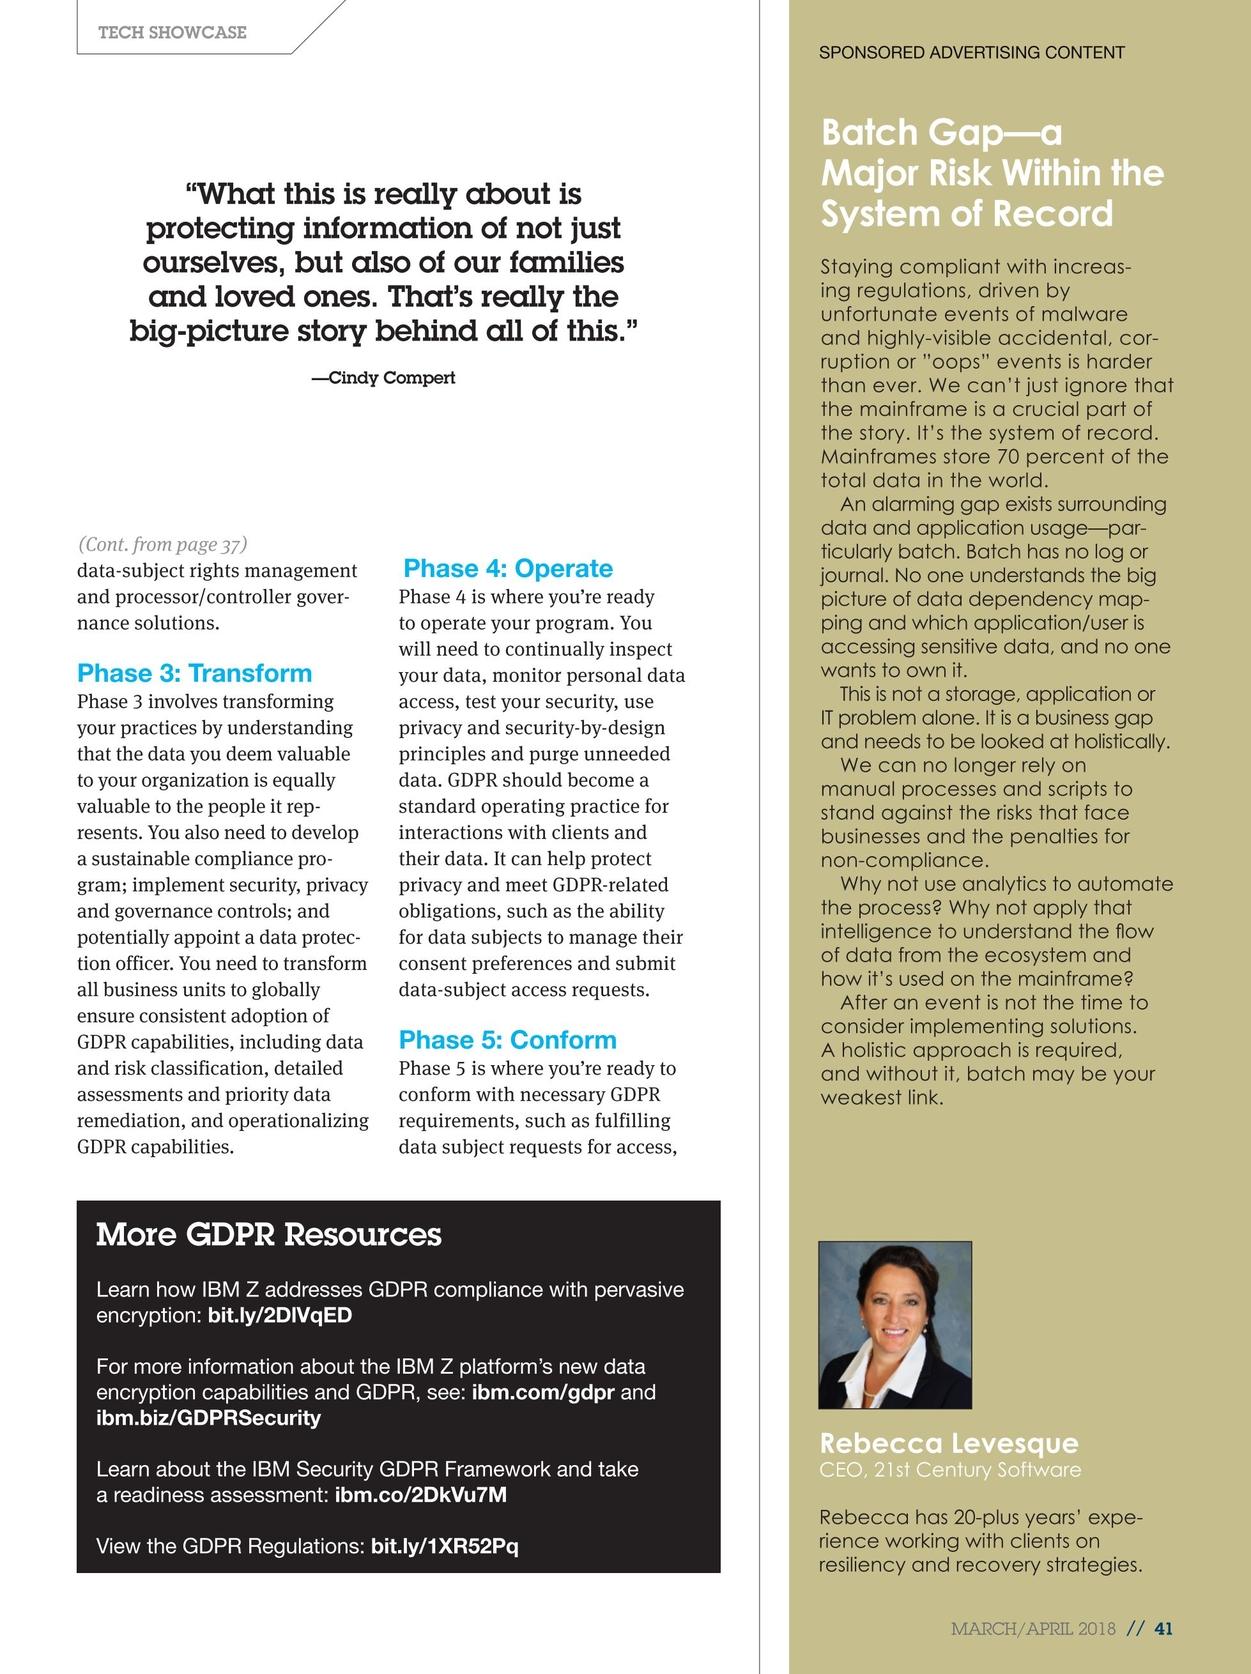 Ibm syncsort manual array ibm systems magazine mainframe march april 2018 rh ibmsystemsmagmainframedigital fandeluxe Images